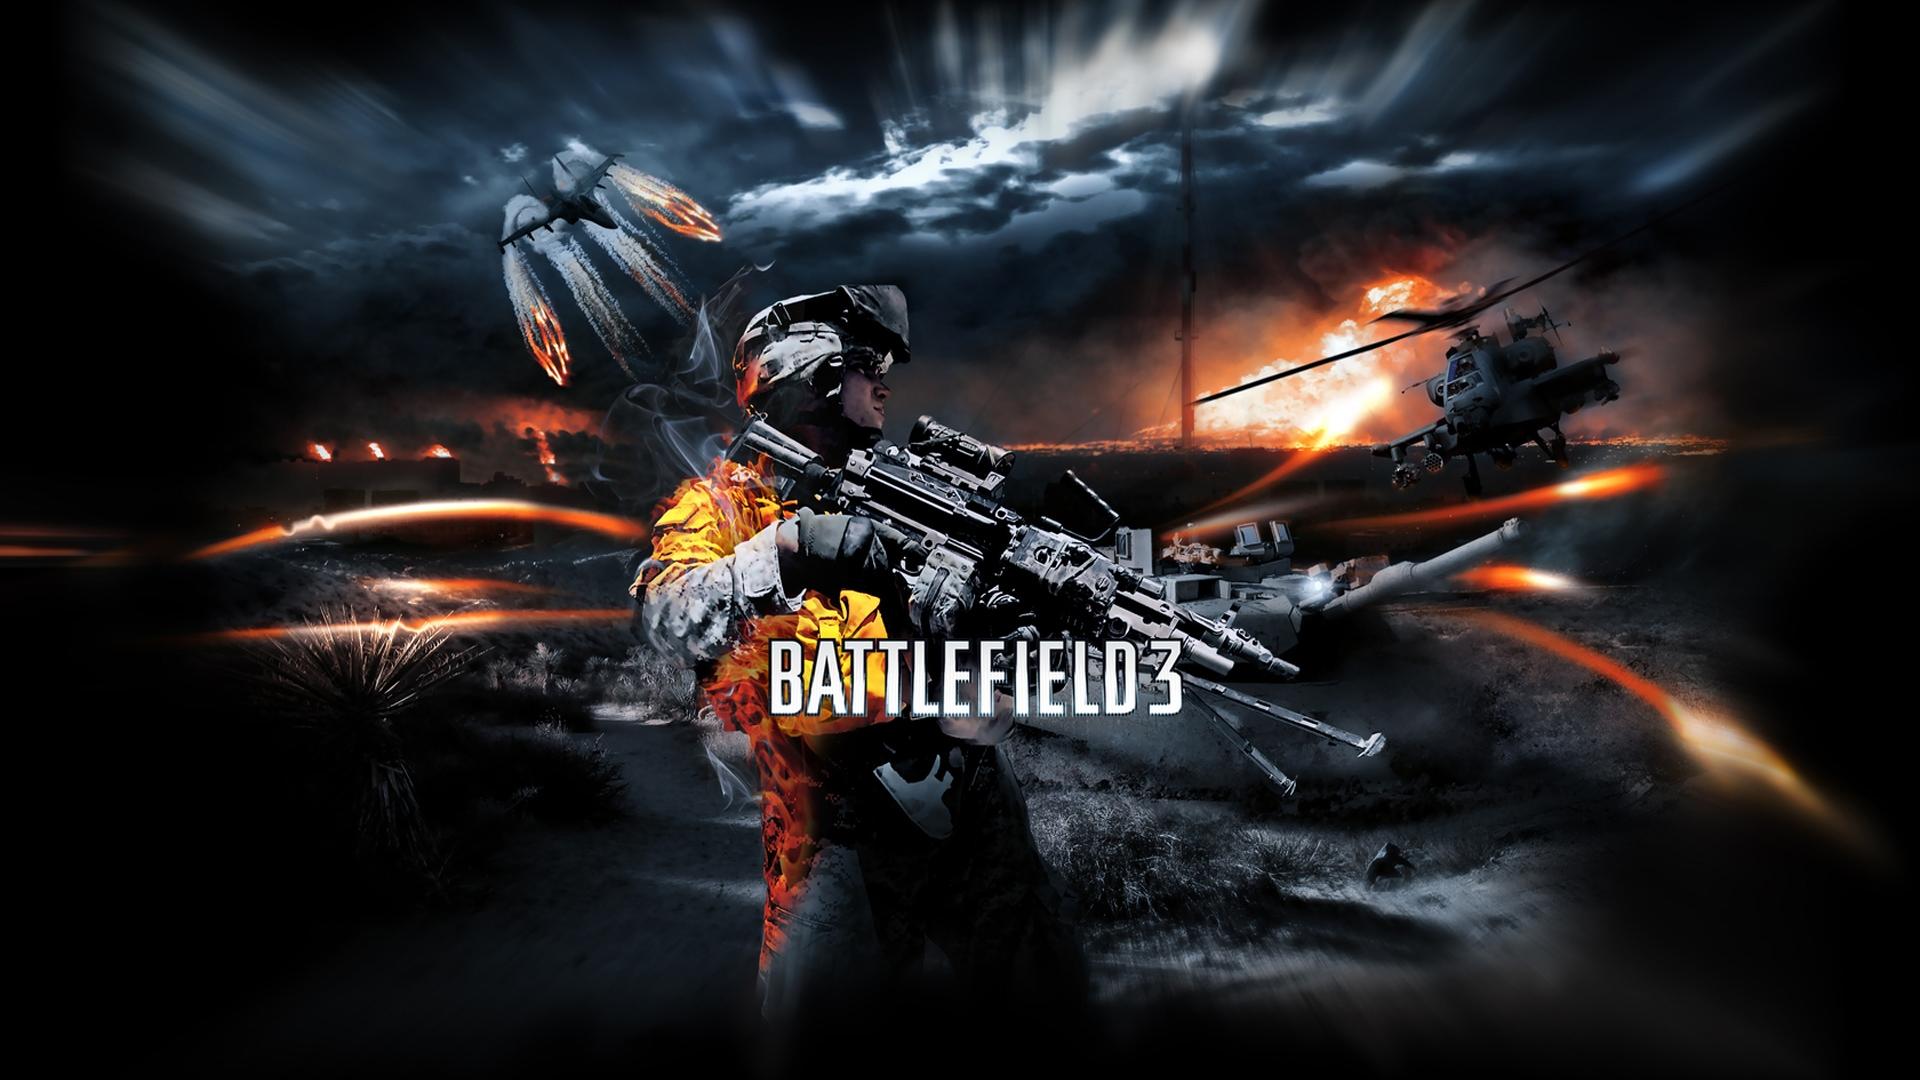 Battlefield 3 WallpaperBackground 39   Battlefield Informer Gallery 1920x1080